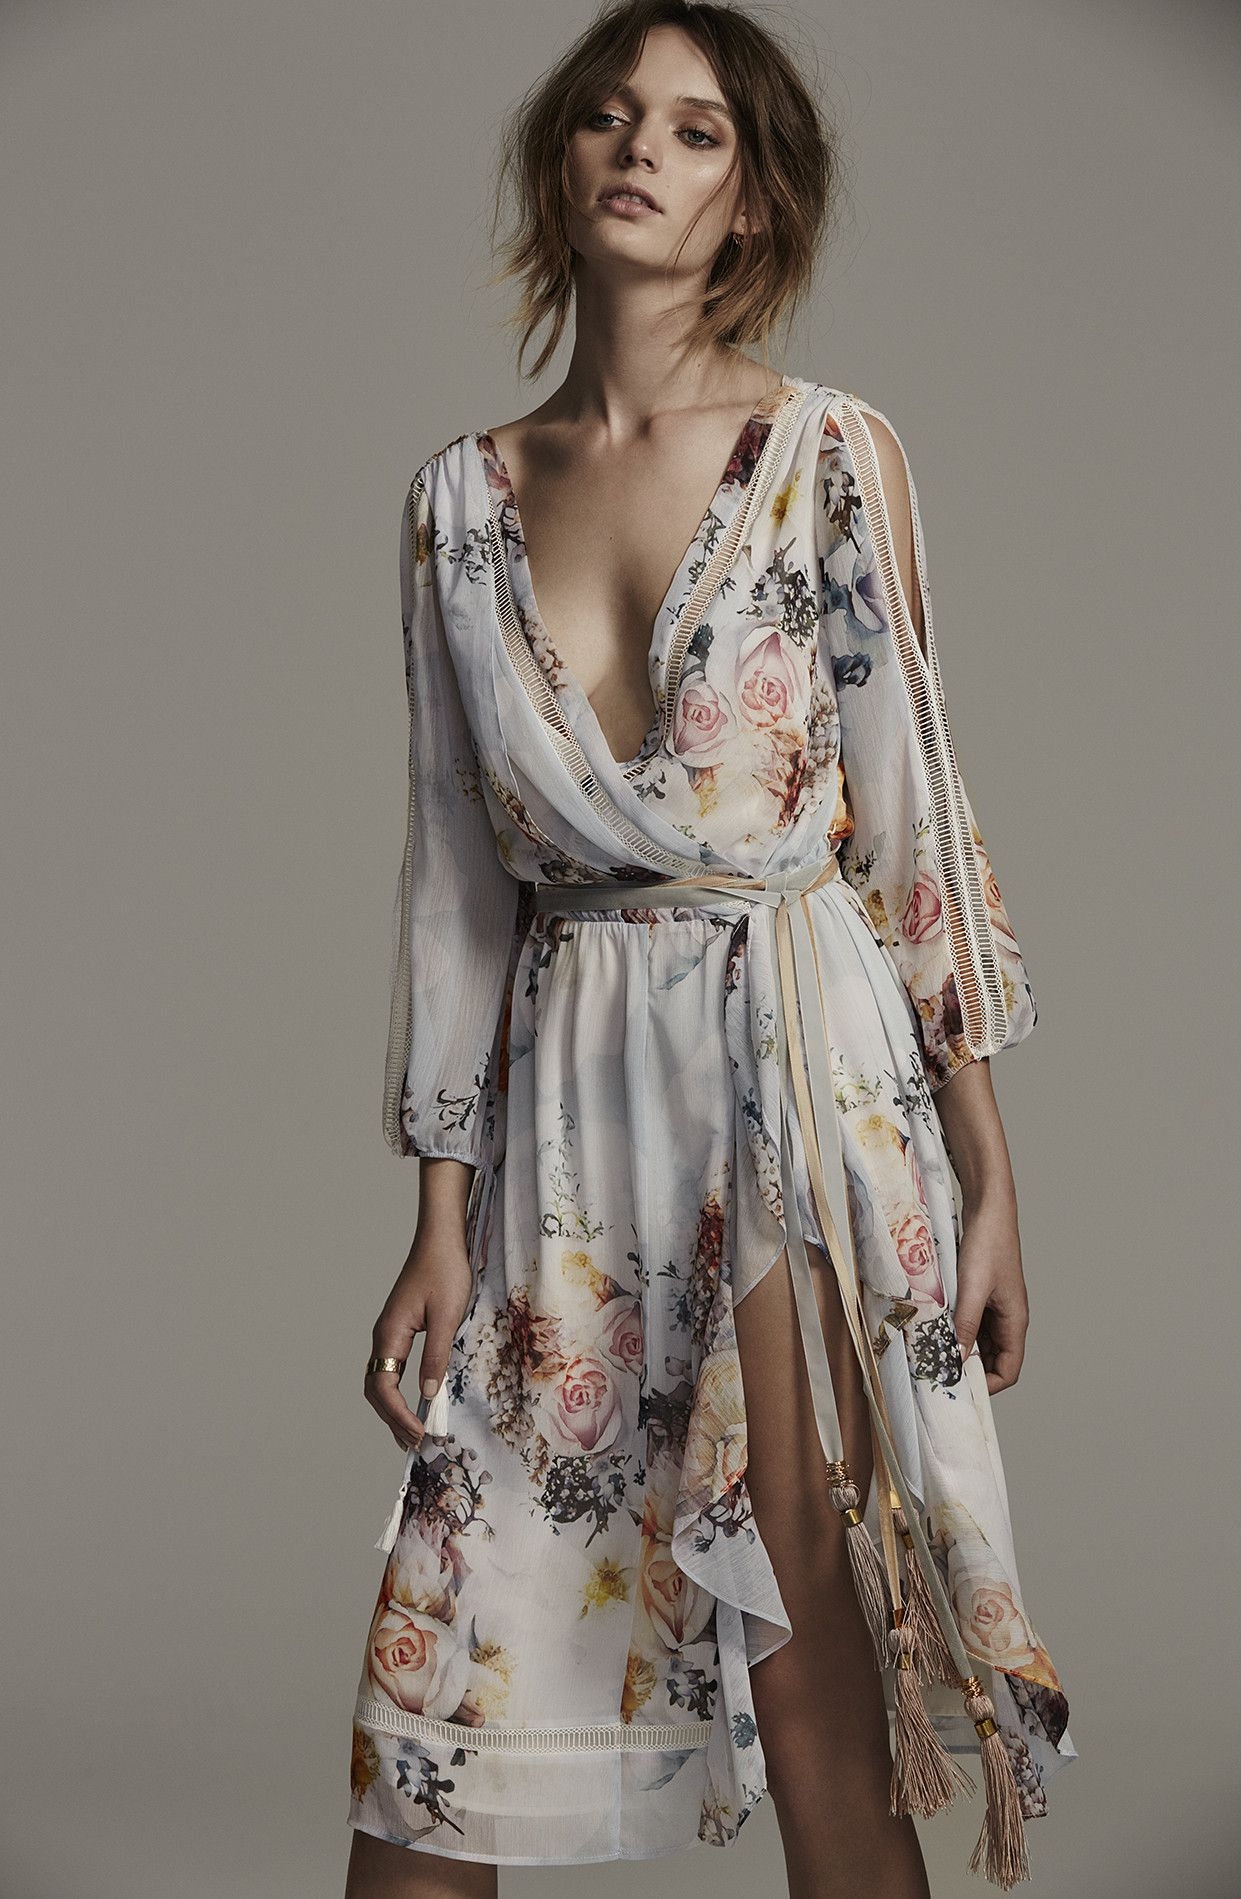 Pin by zaha on wedding pinterest primroses midi dresses and boho